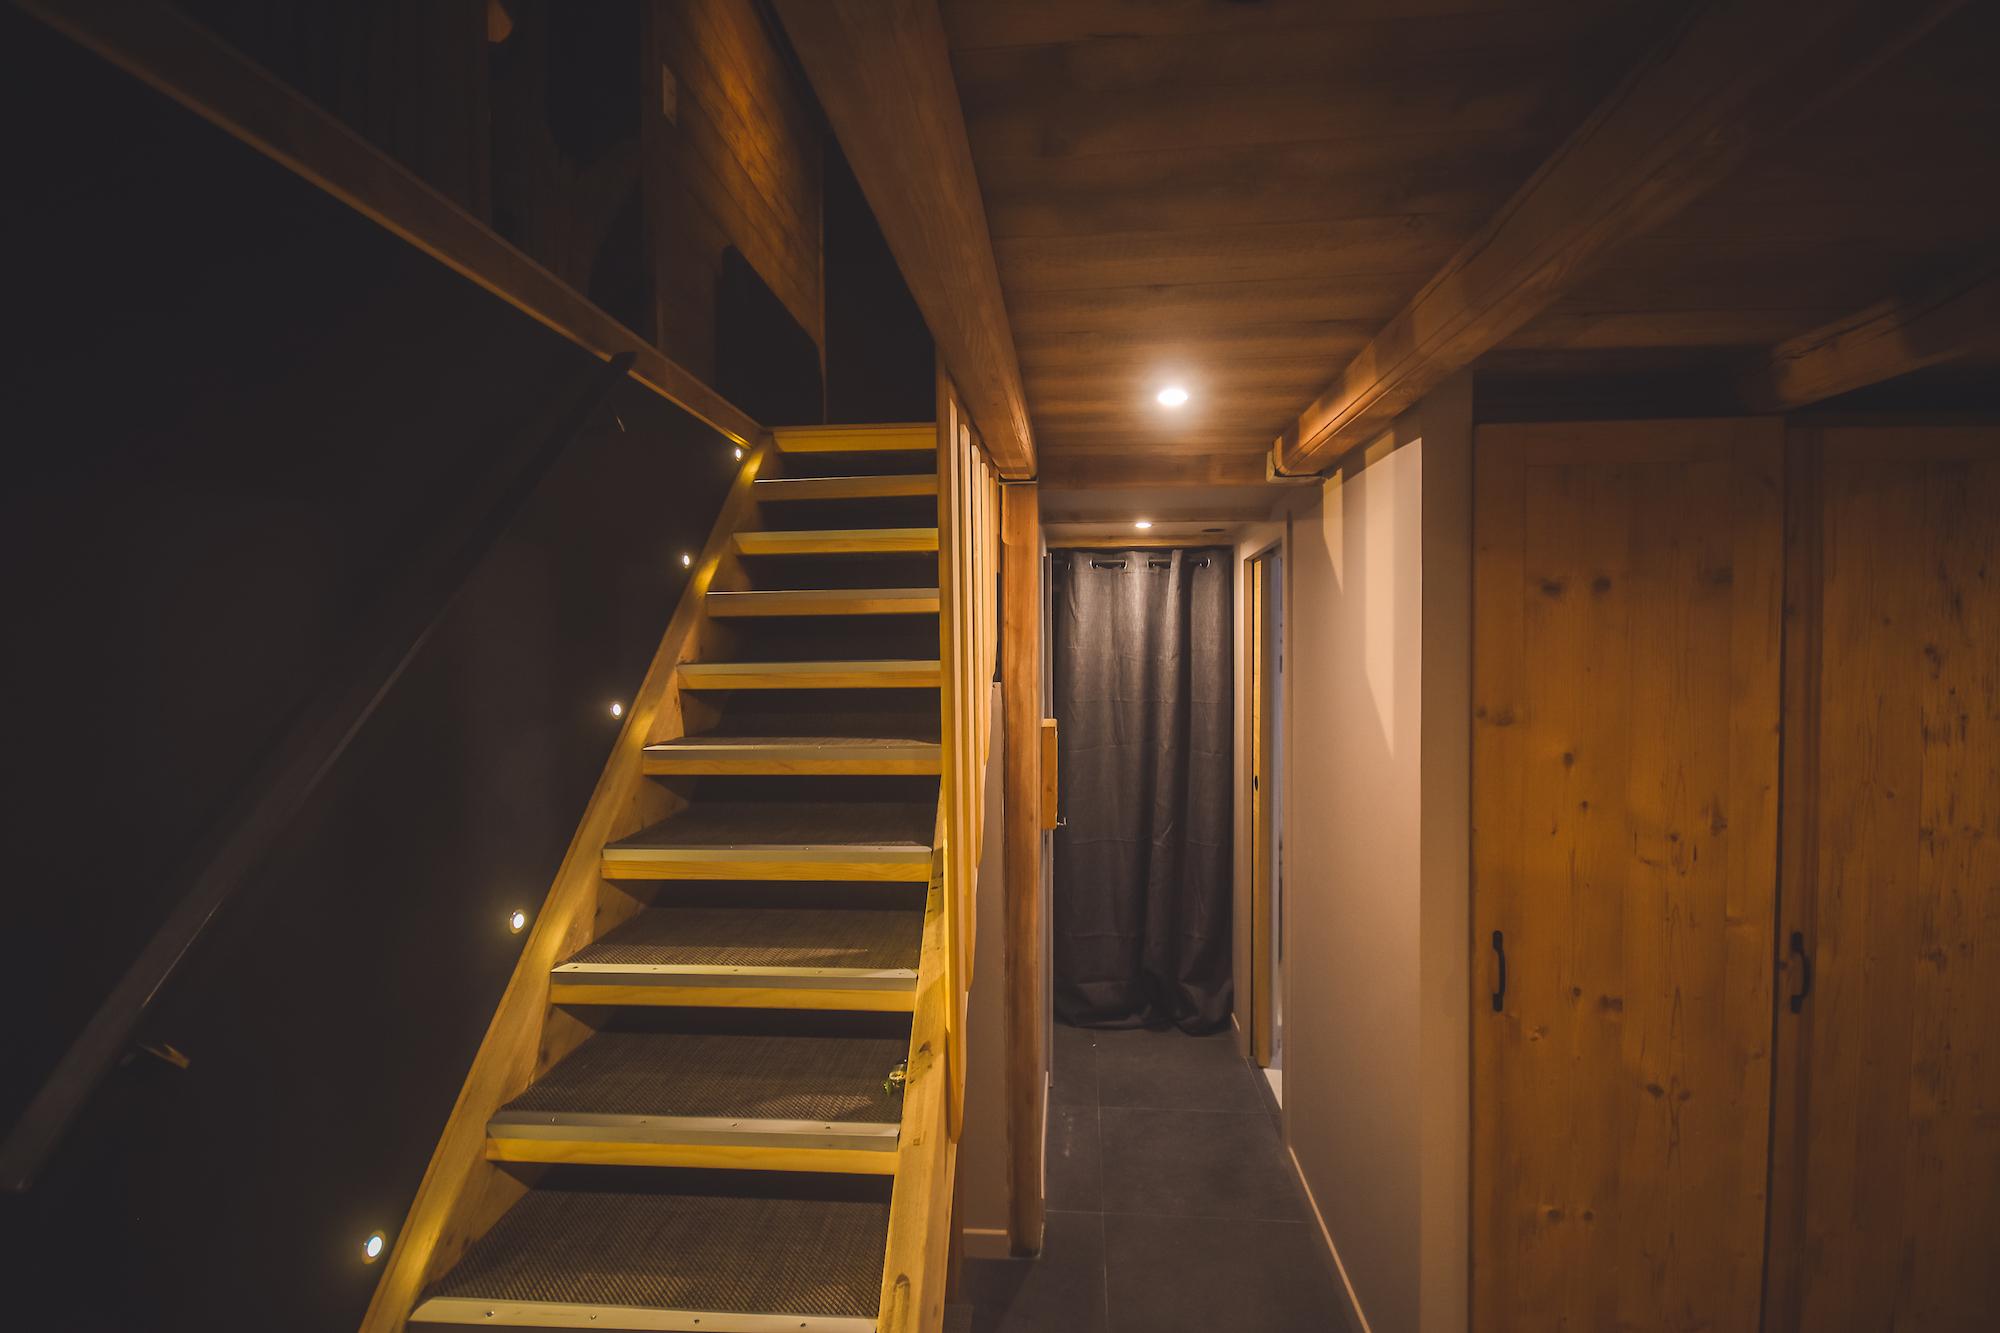 Escalier xs